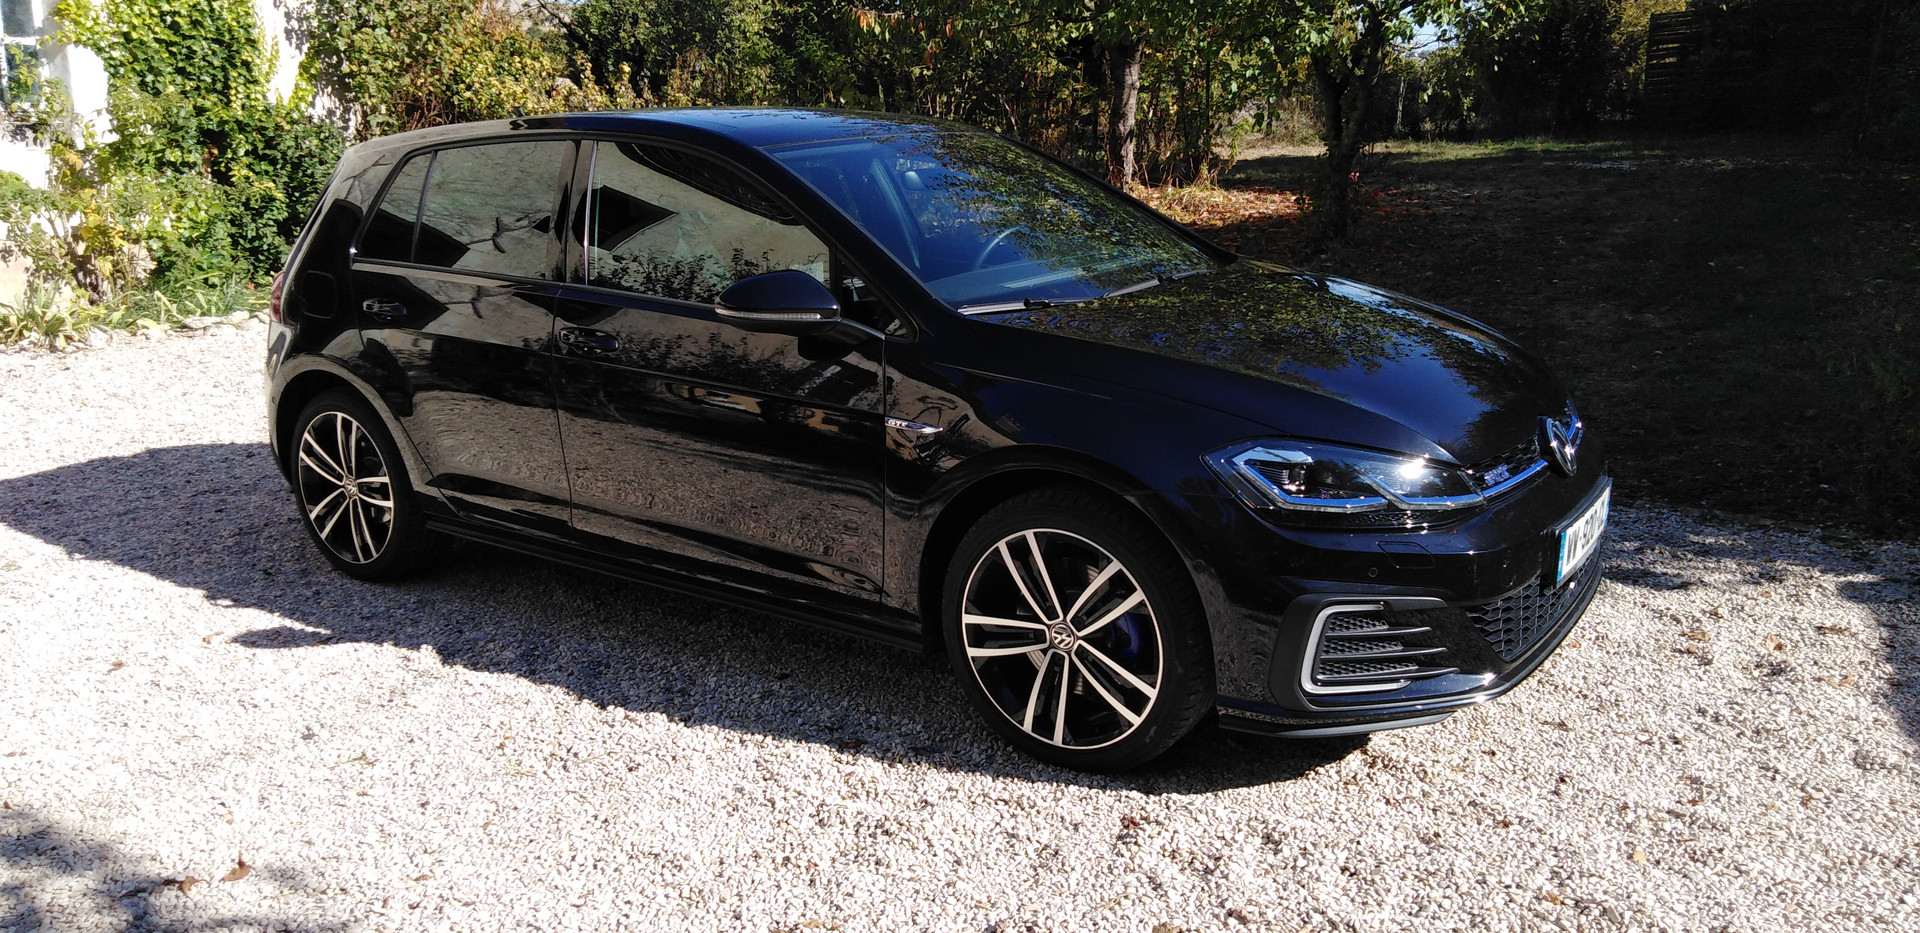 VW GOLF VII GTE Hybride côté